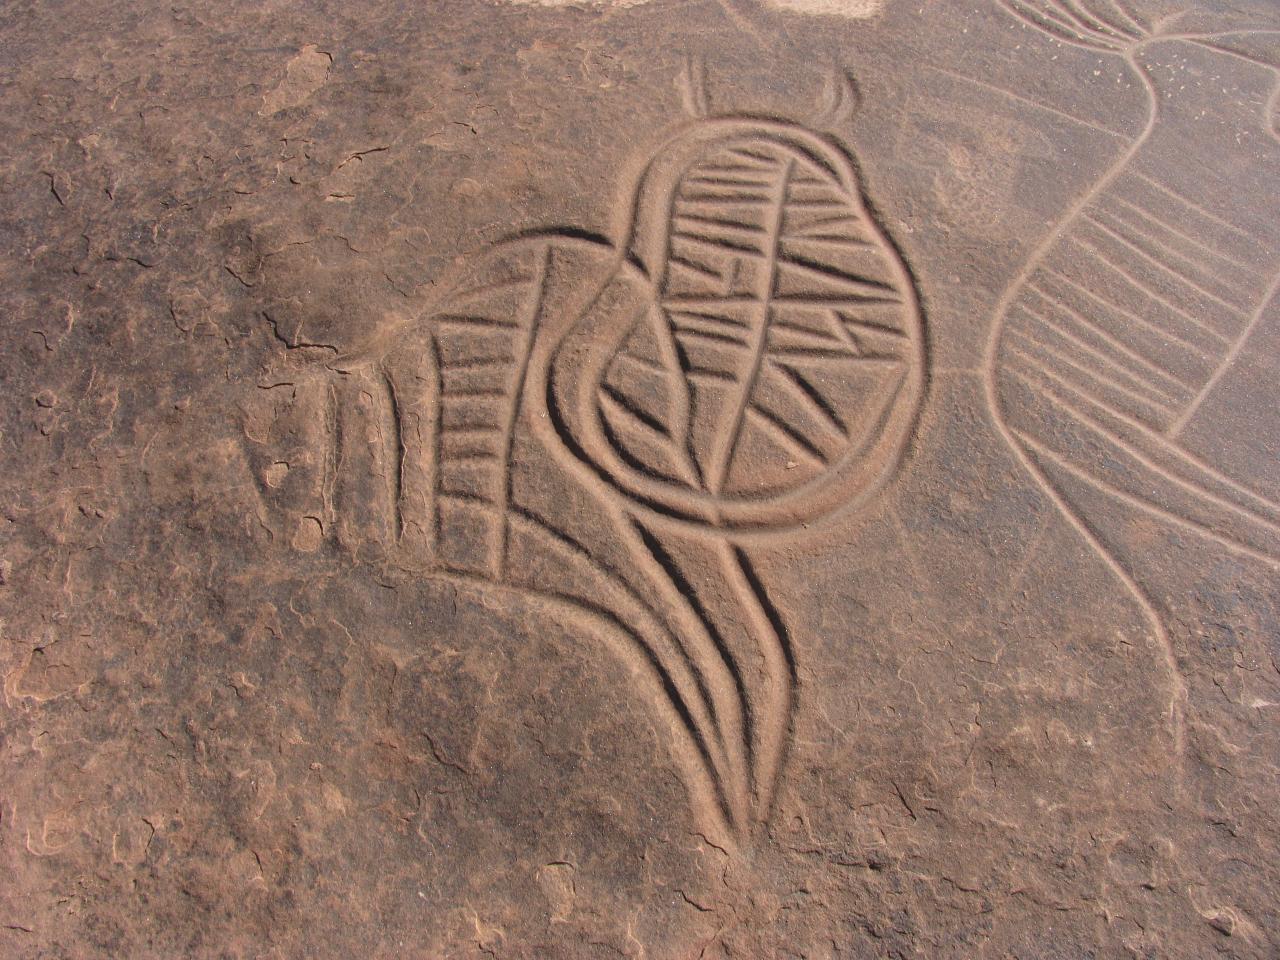 Gravures rupestres piste Ich Figuig